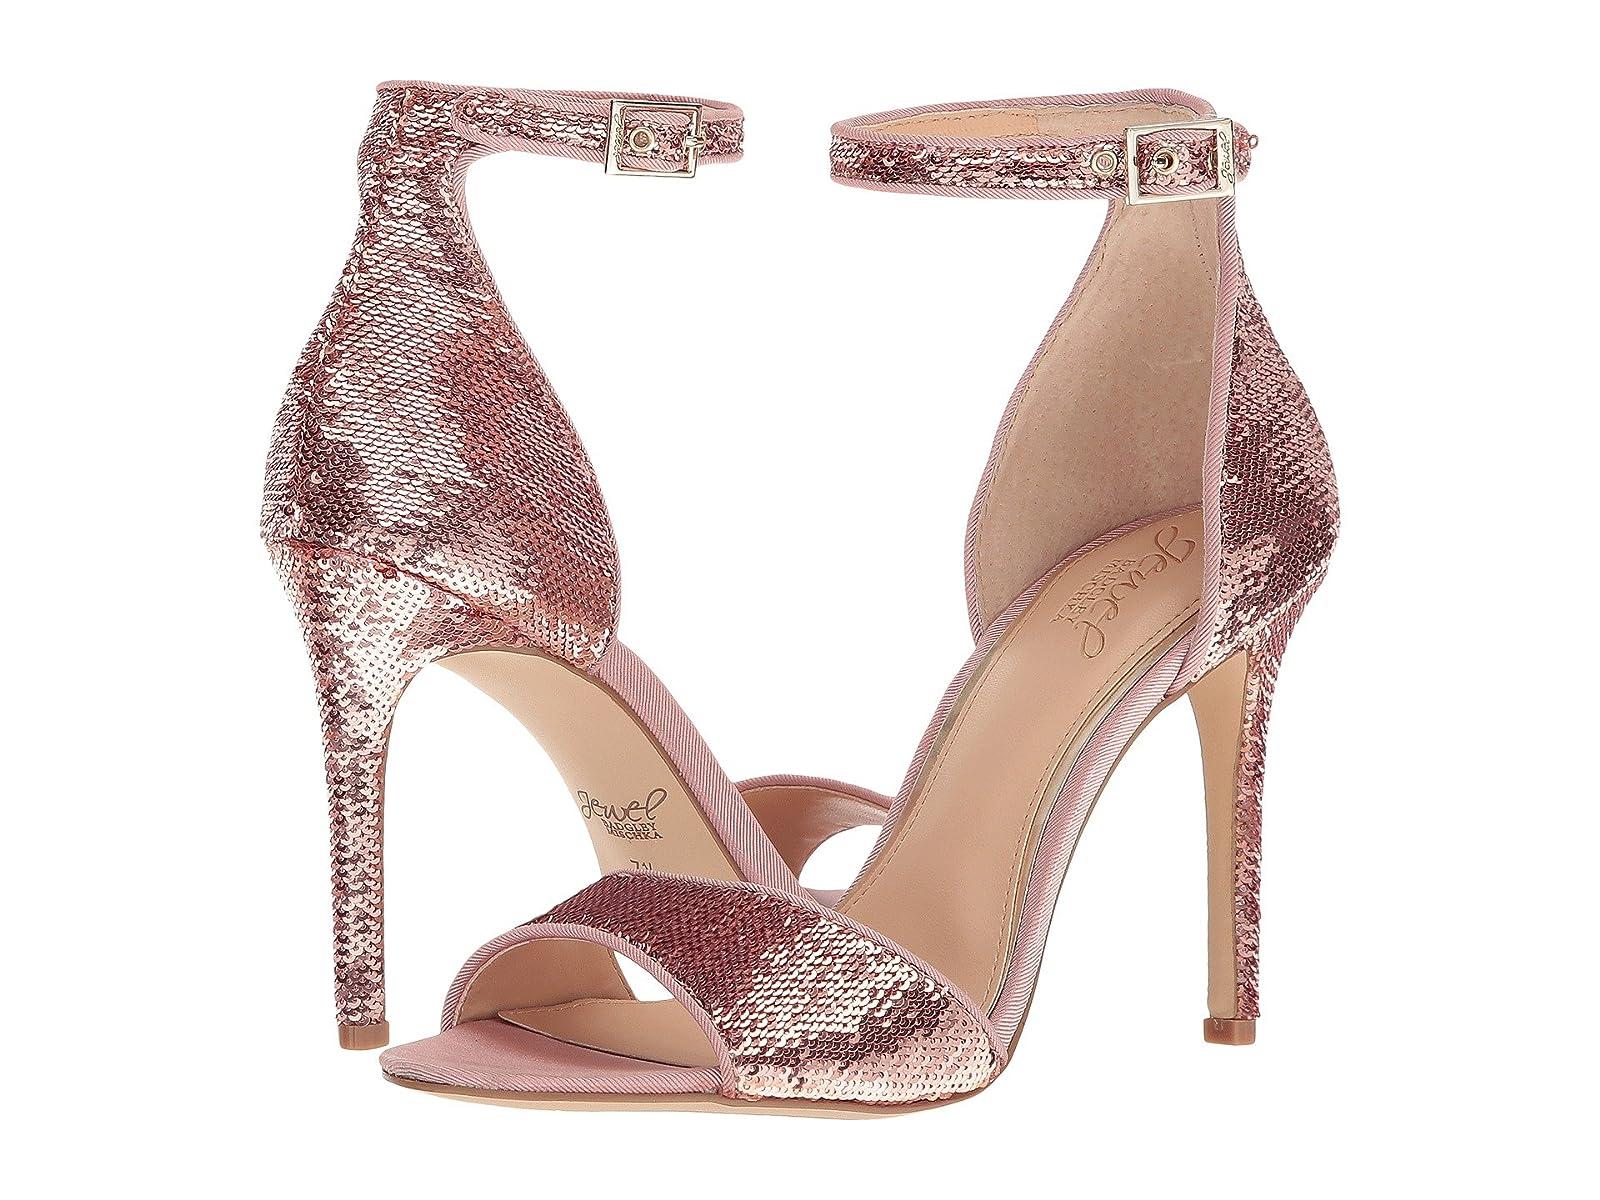 Jewel Badgley Mischka LorenaCheap and distinctive eye-catching shoes